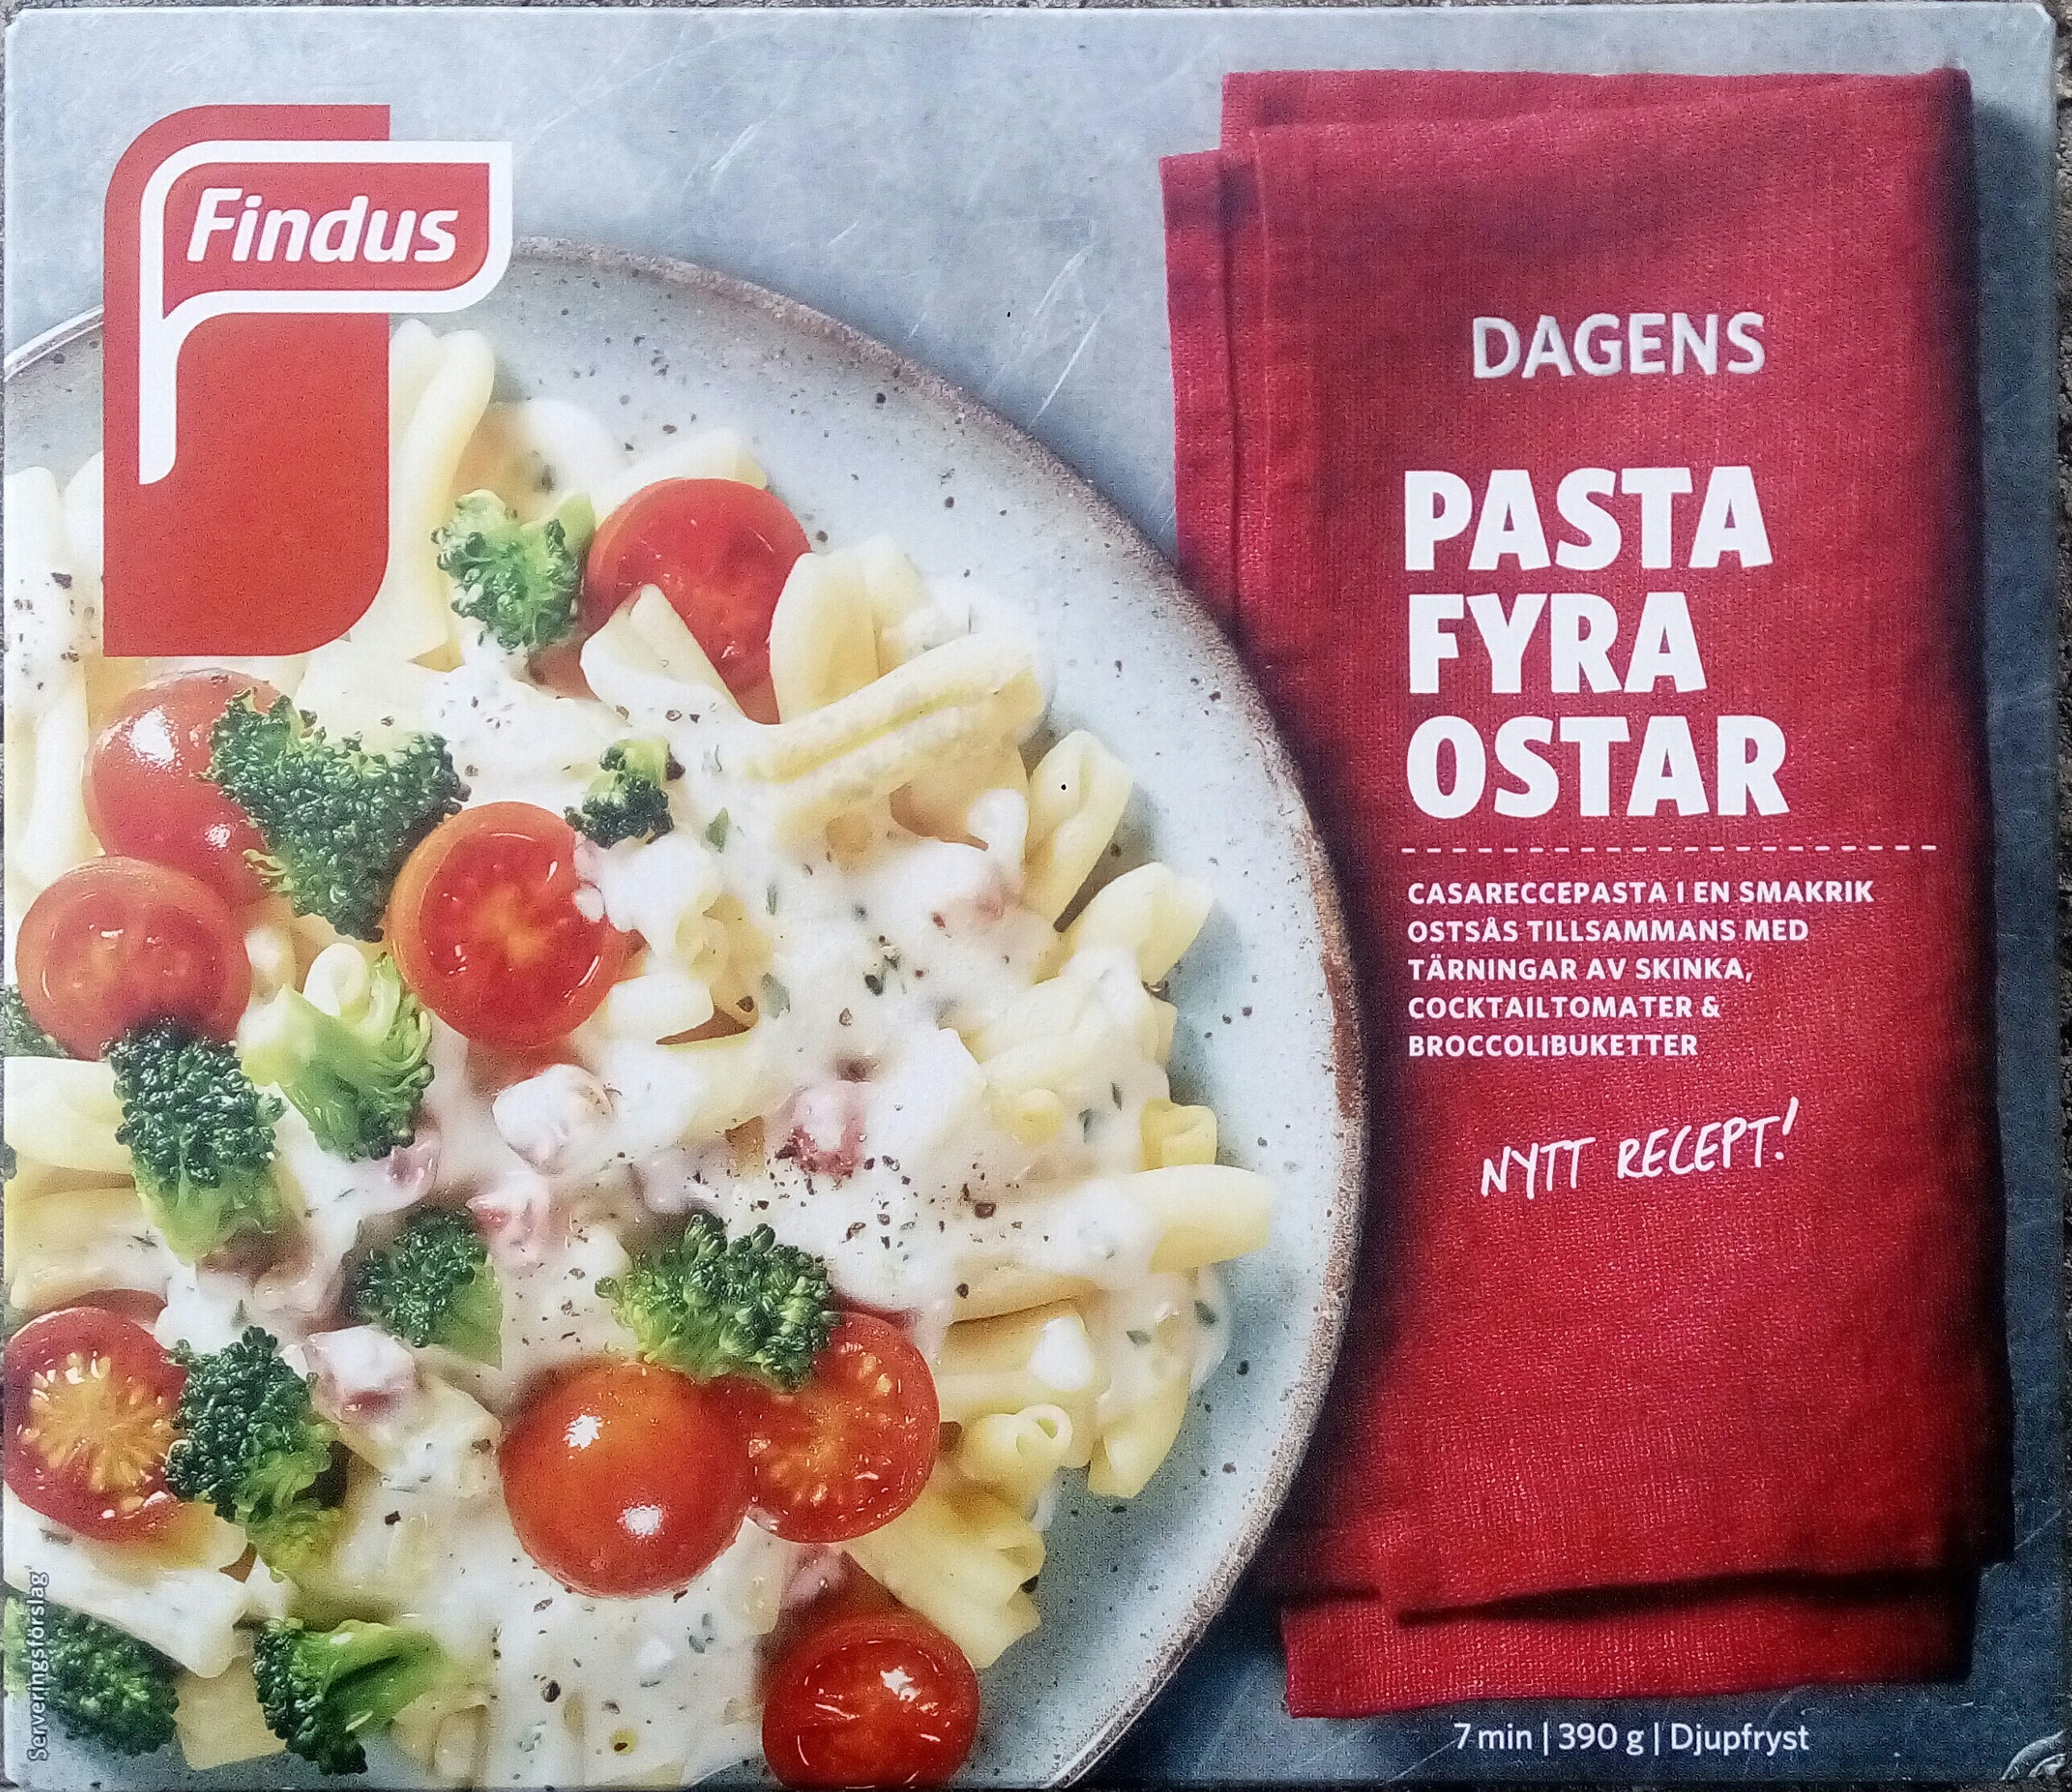 Findus Dagens Pasta fyra ostar - Product - sv